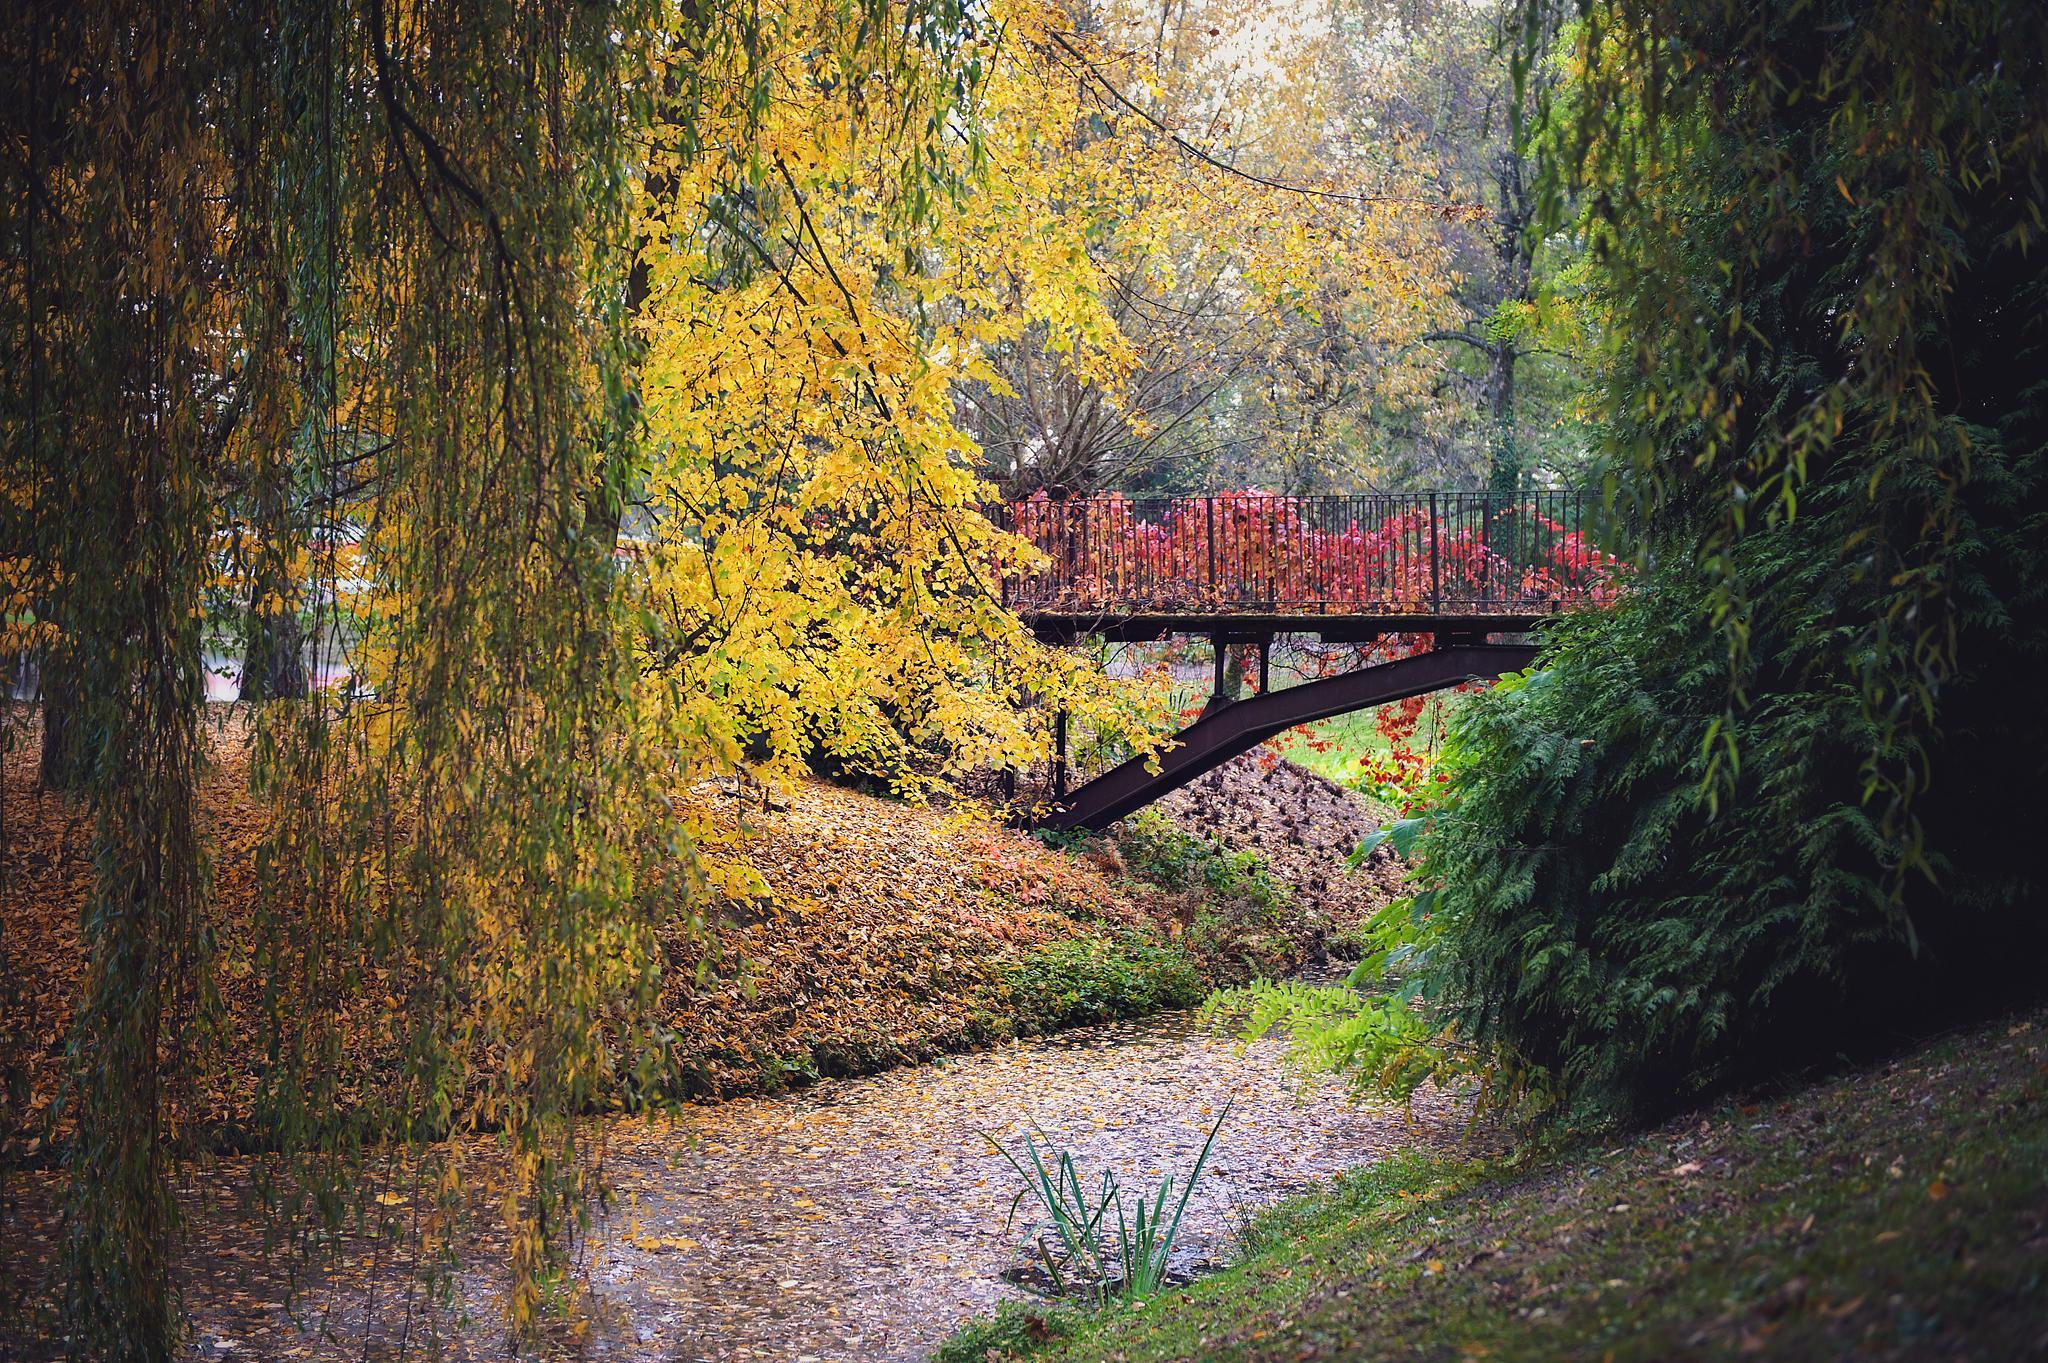 Botanic Garden by Joanna Bartkowiak